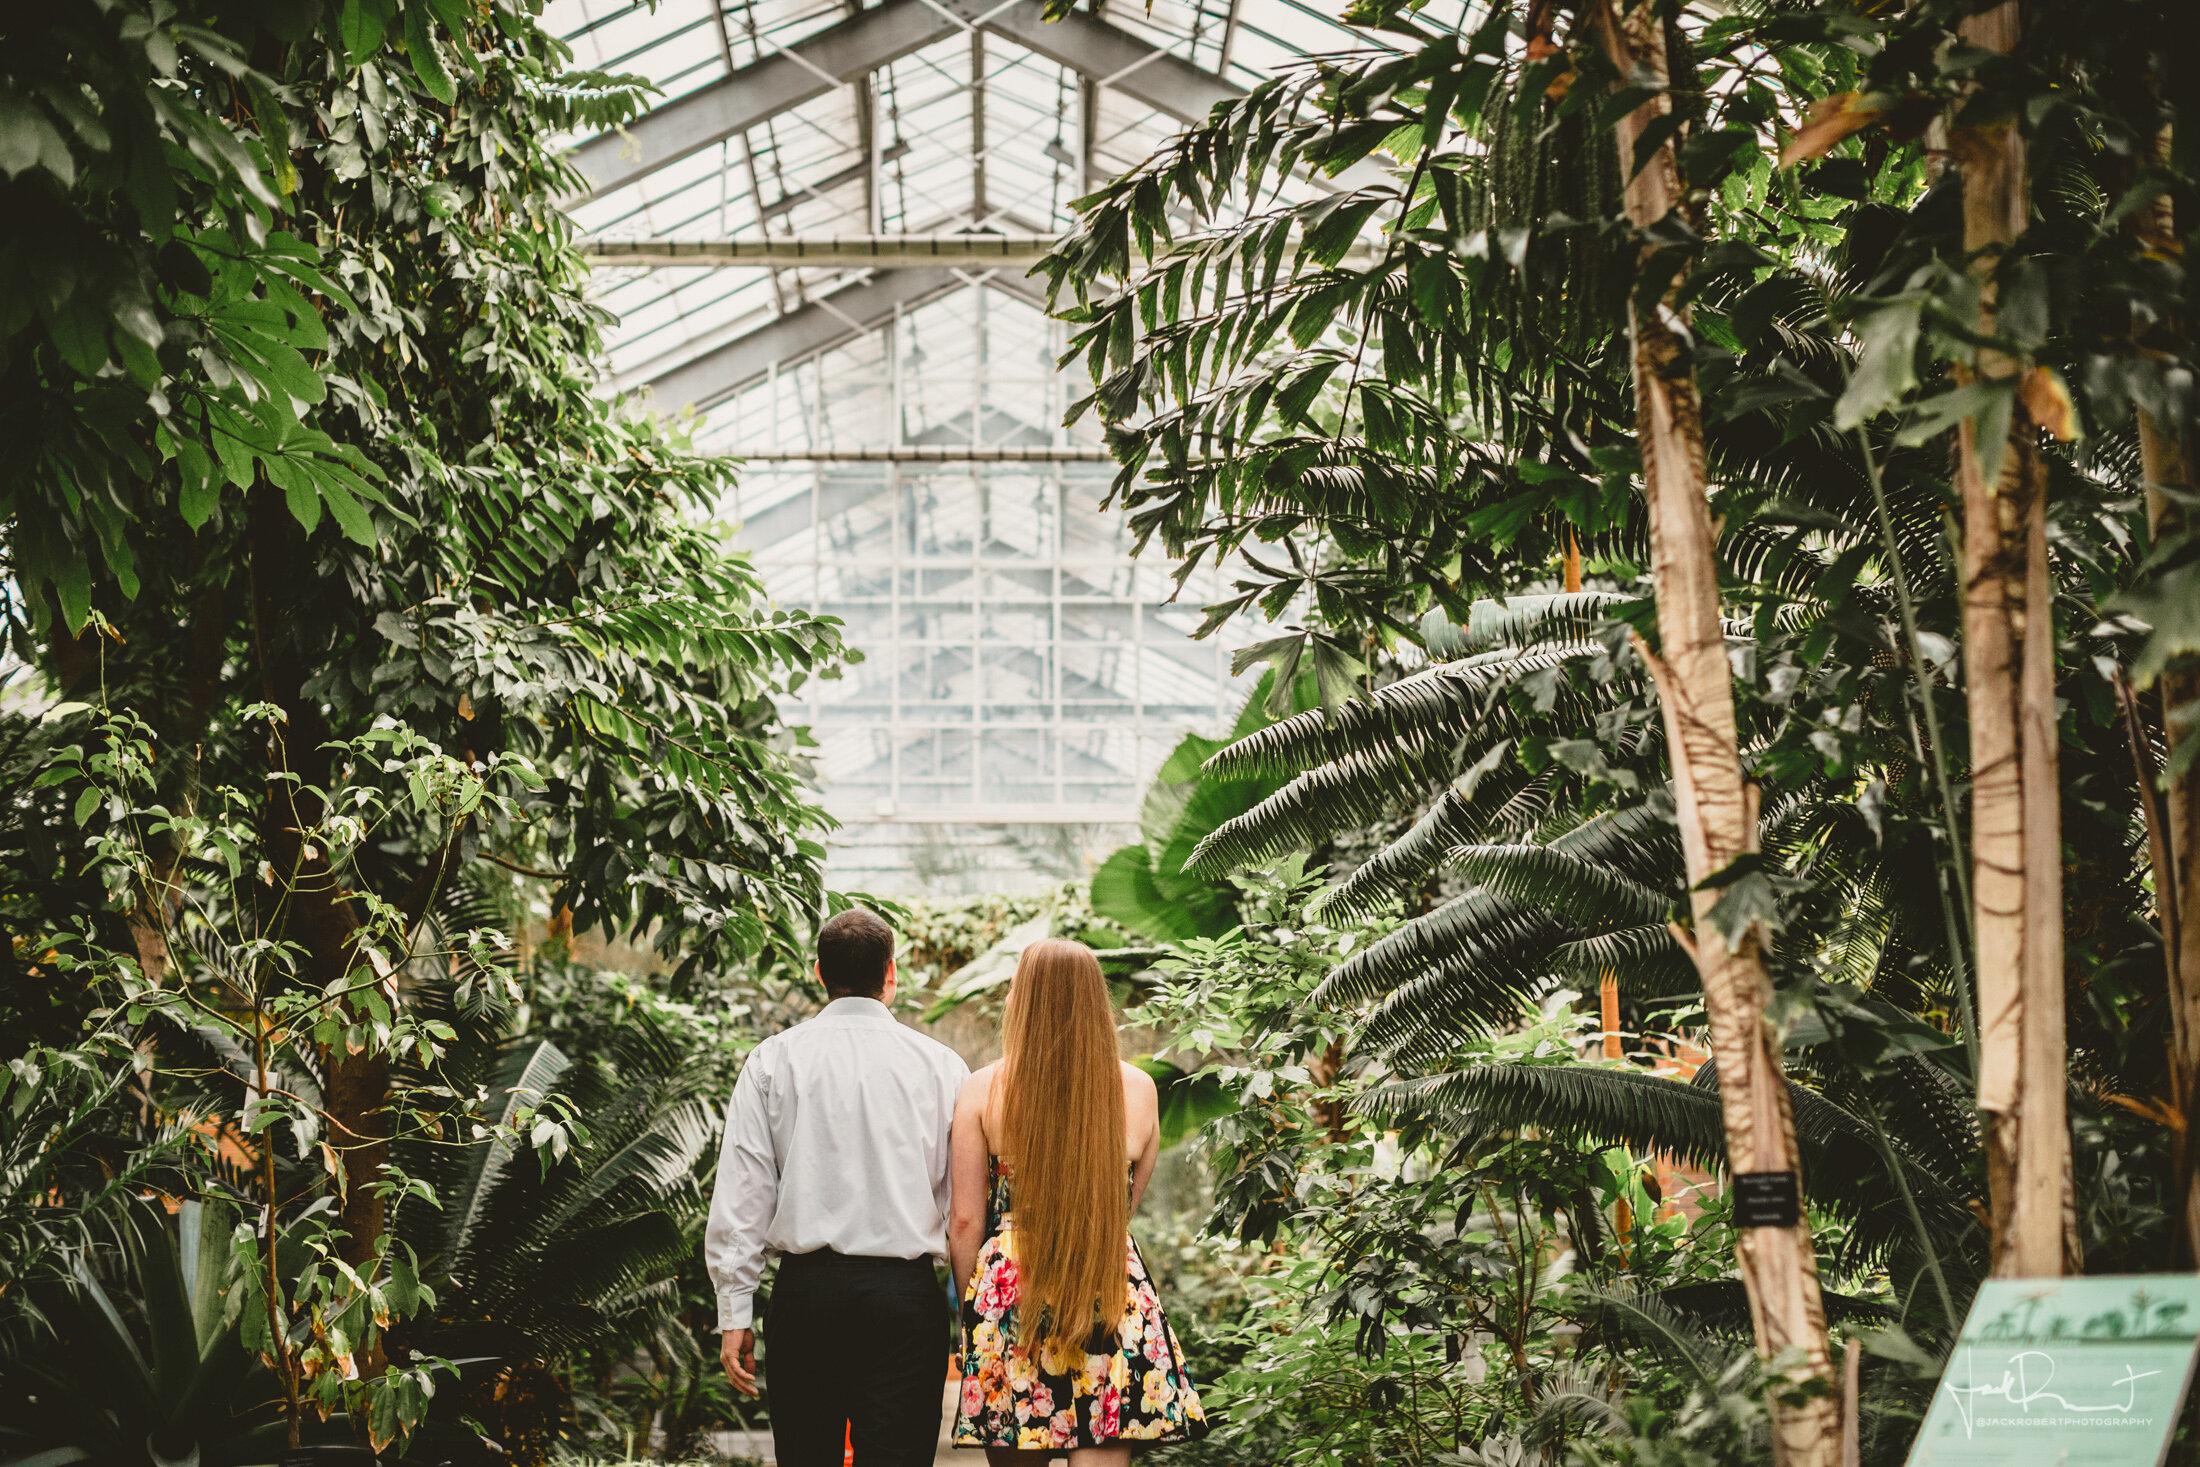 Greenhouse Conservatory Engagement Session - University of Michigan Matthaei Botanical Gardens